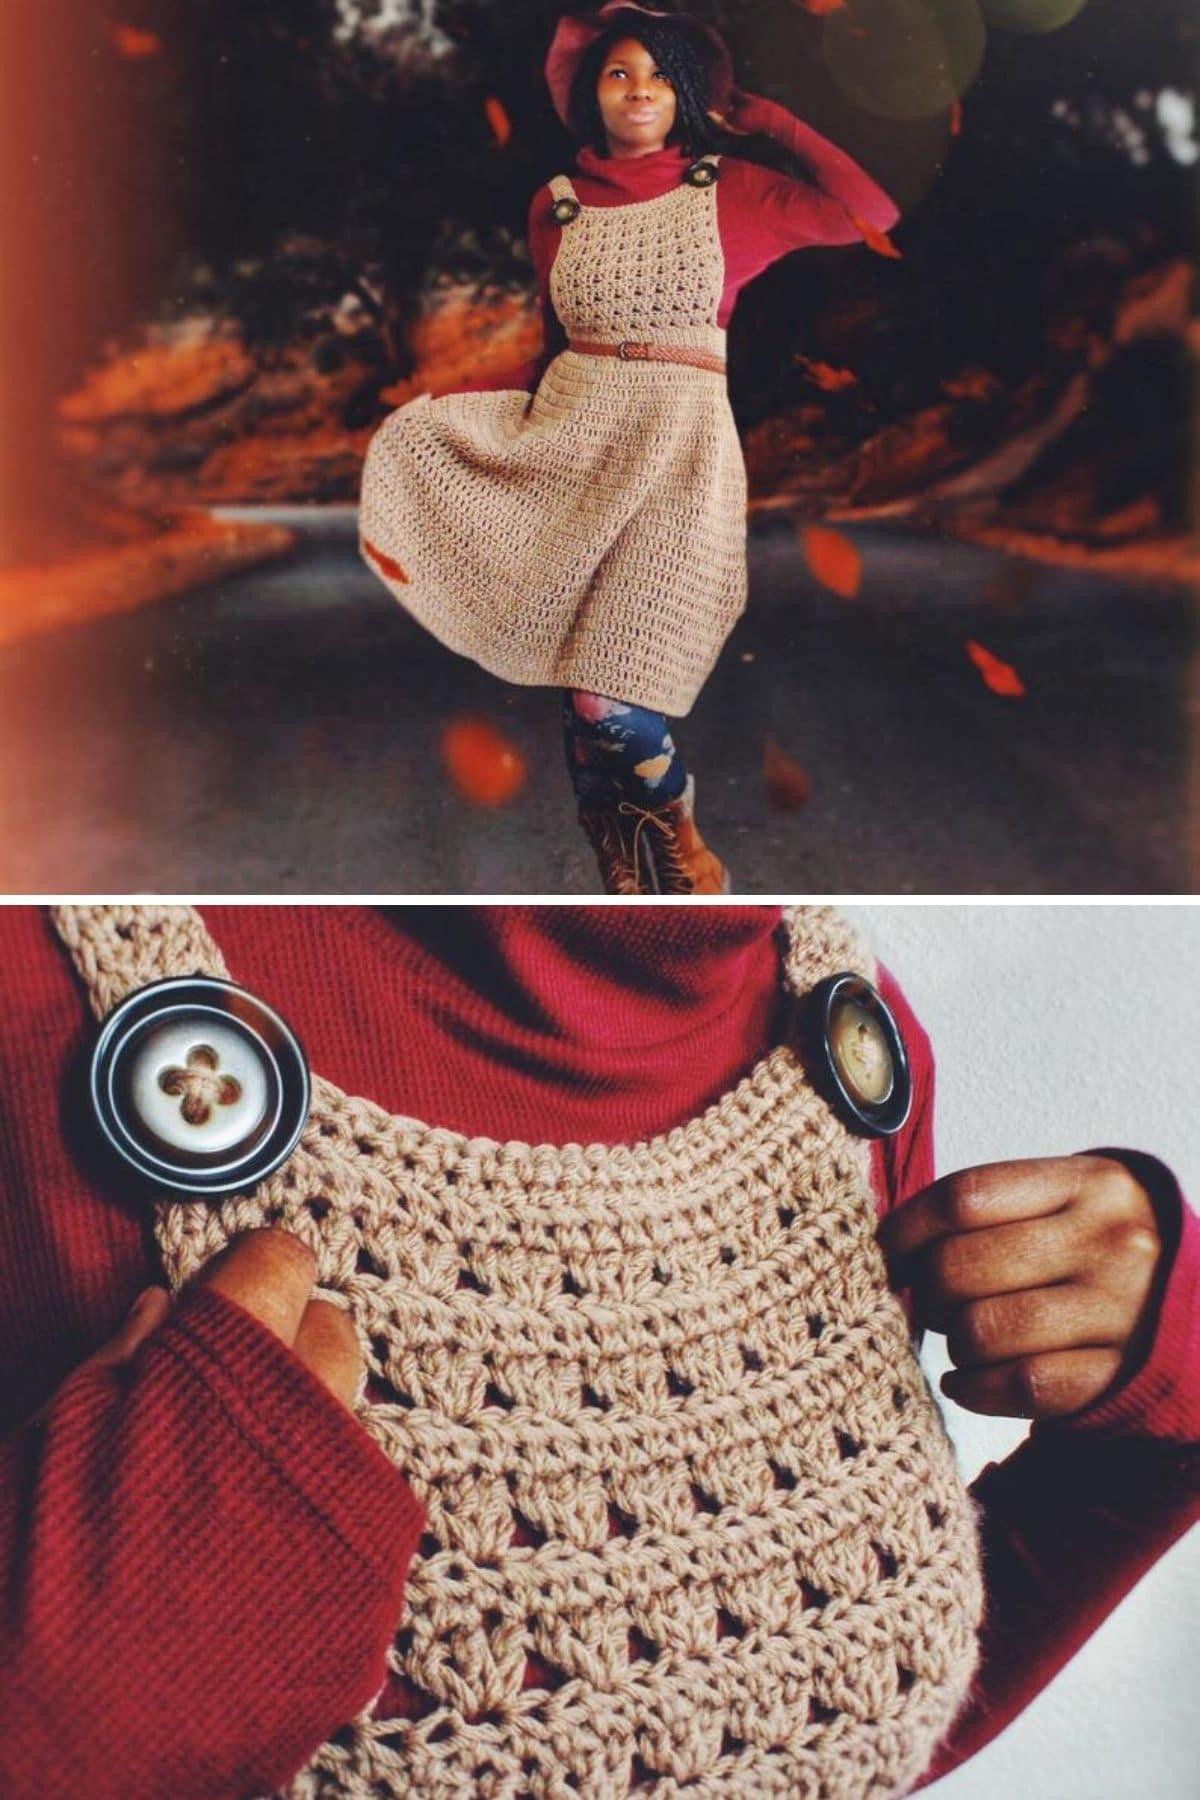 Black woman in tan crochet overall dress